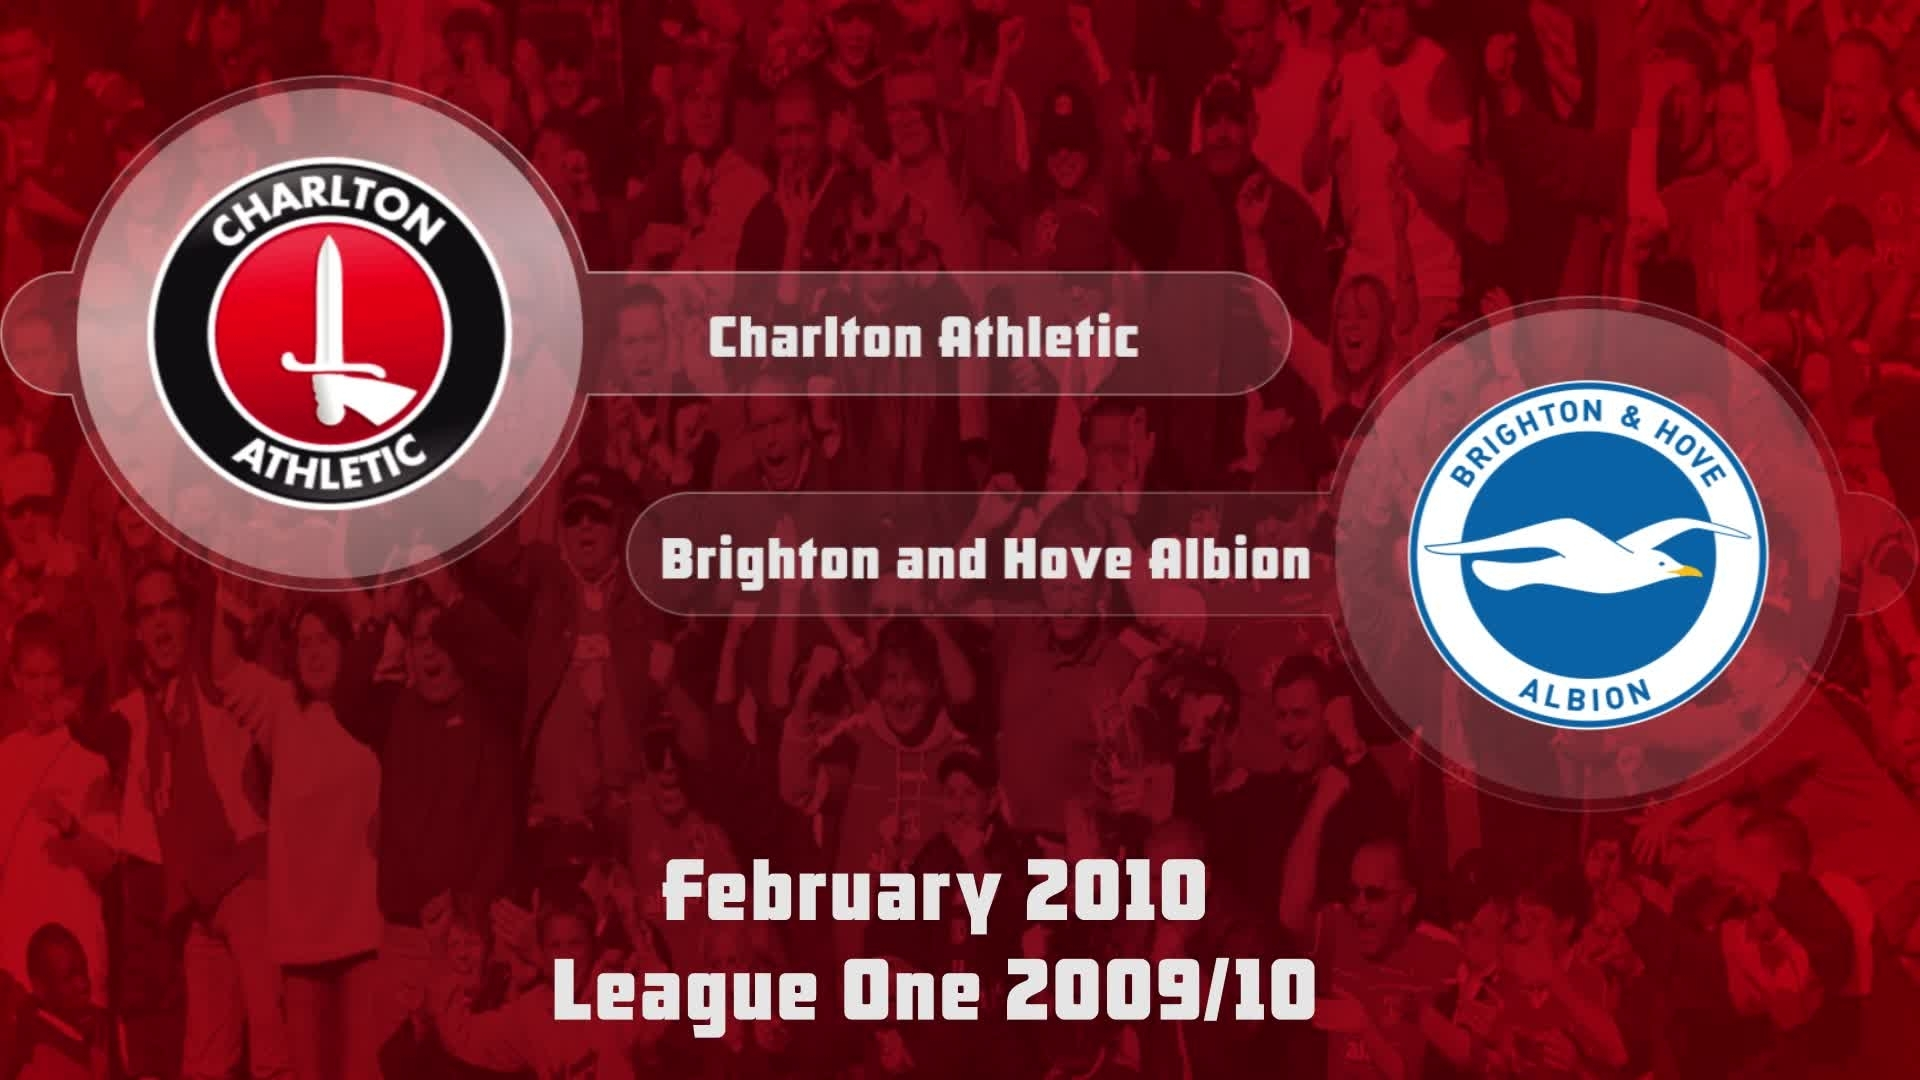 37 HIGHLIGHTS | Charlton 1 Brighton and Hove 2 (Feb 2010)